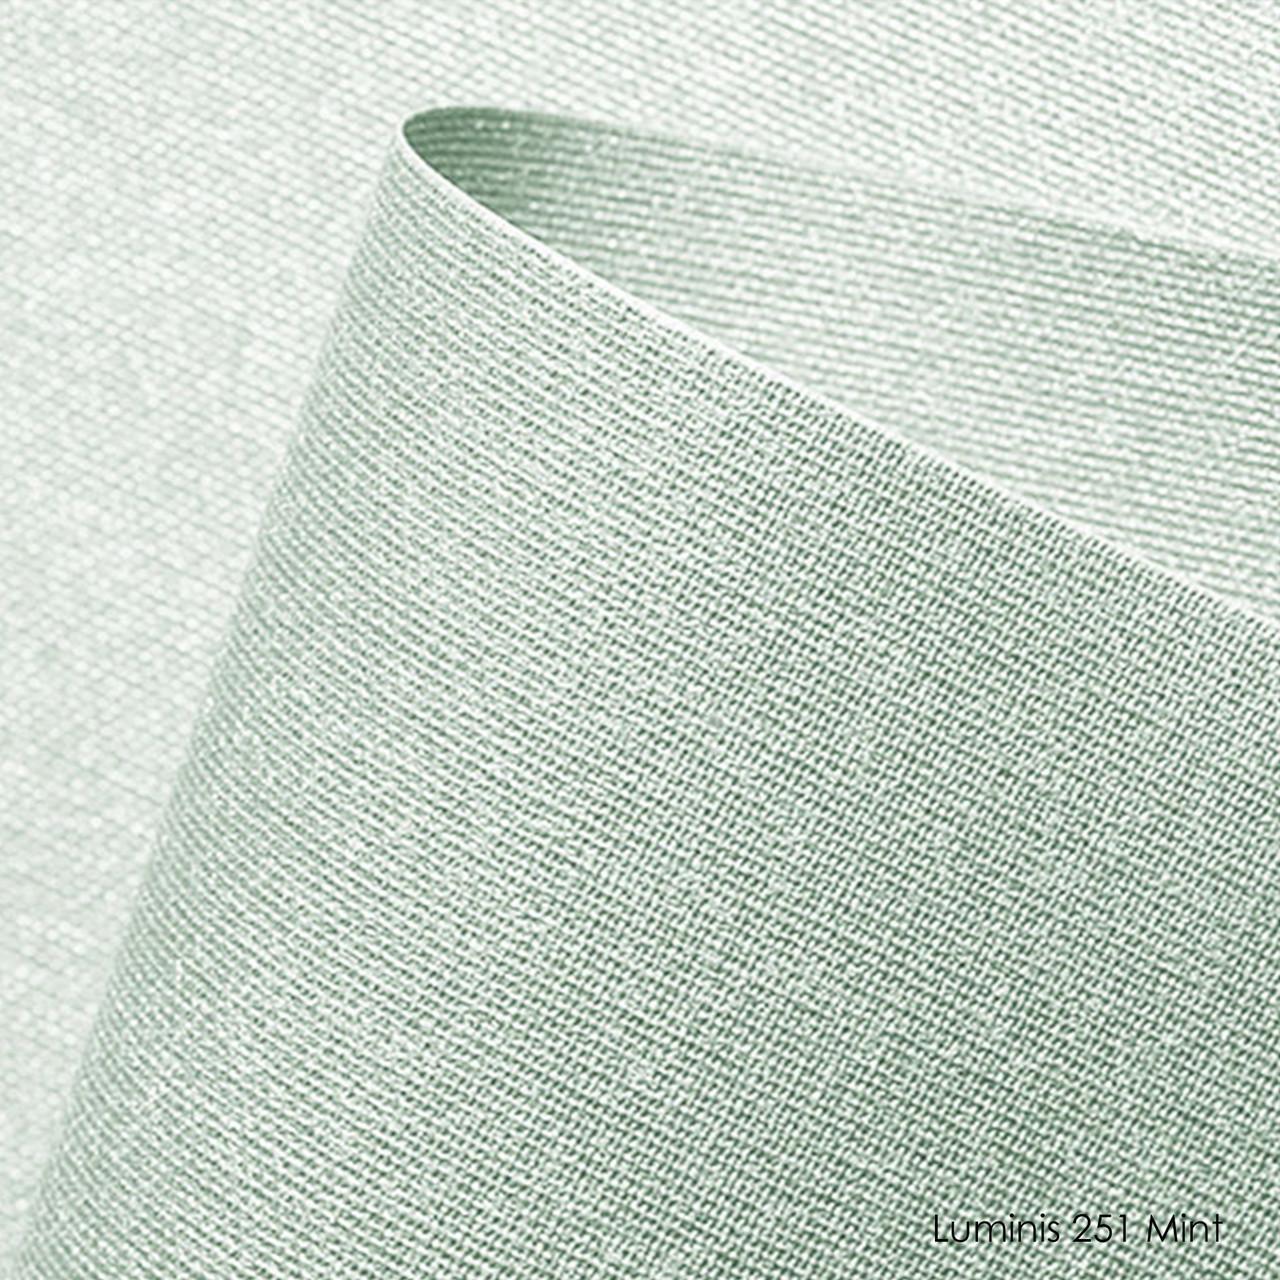 Ролеты тканевые Luminis-251 mint